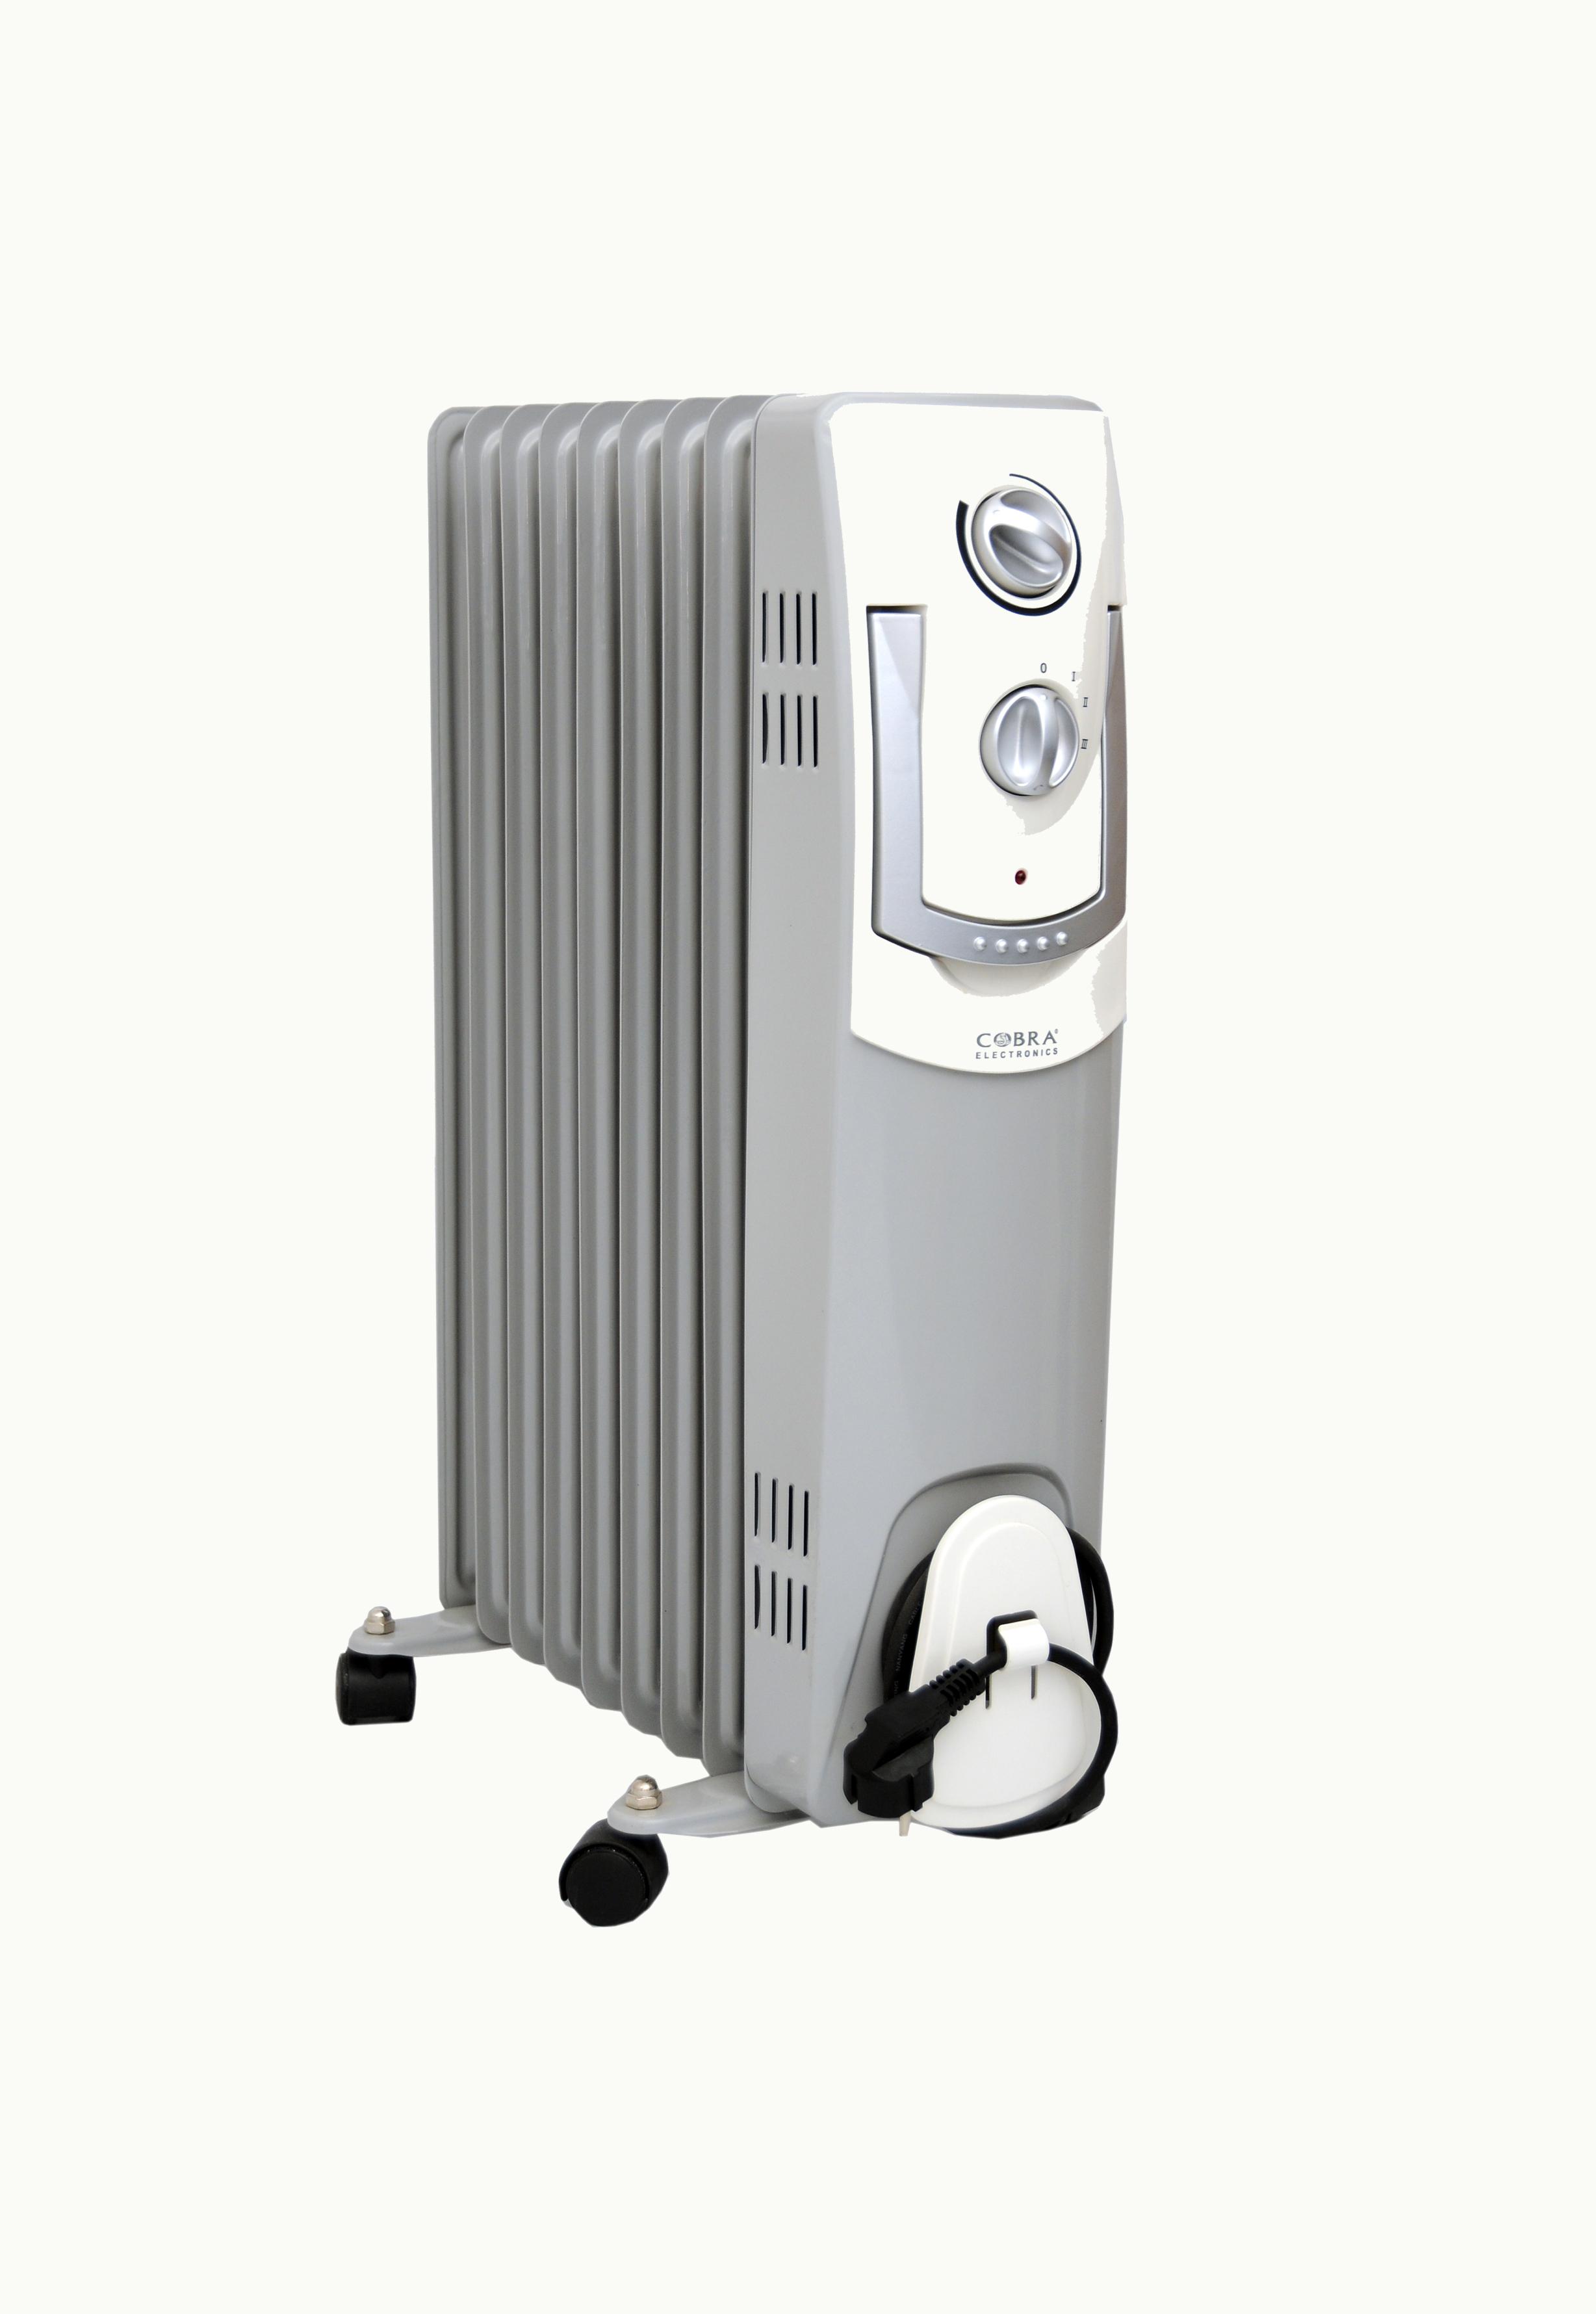 Ahurissant radiateur bain d huile renaa conception - Radiateur bain d huile consommation ...